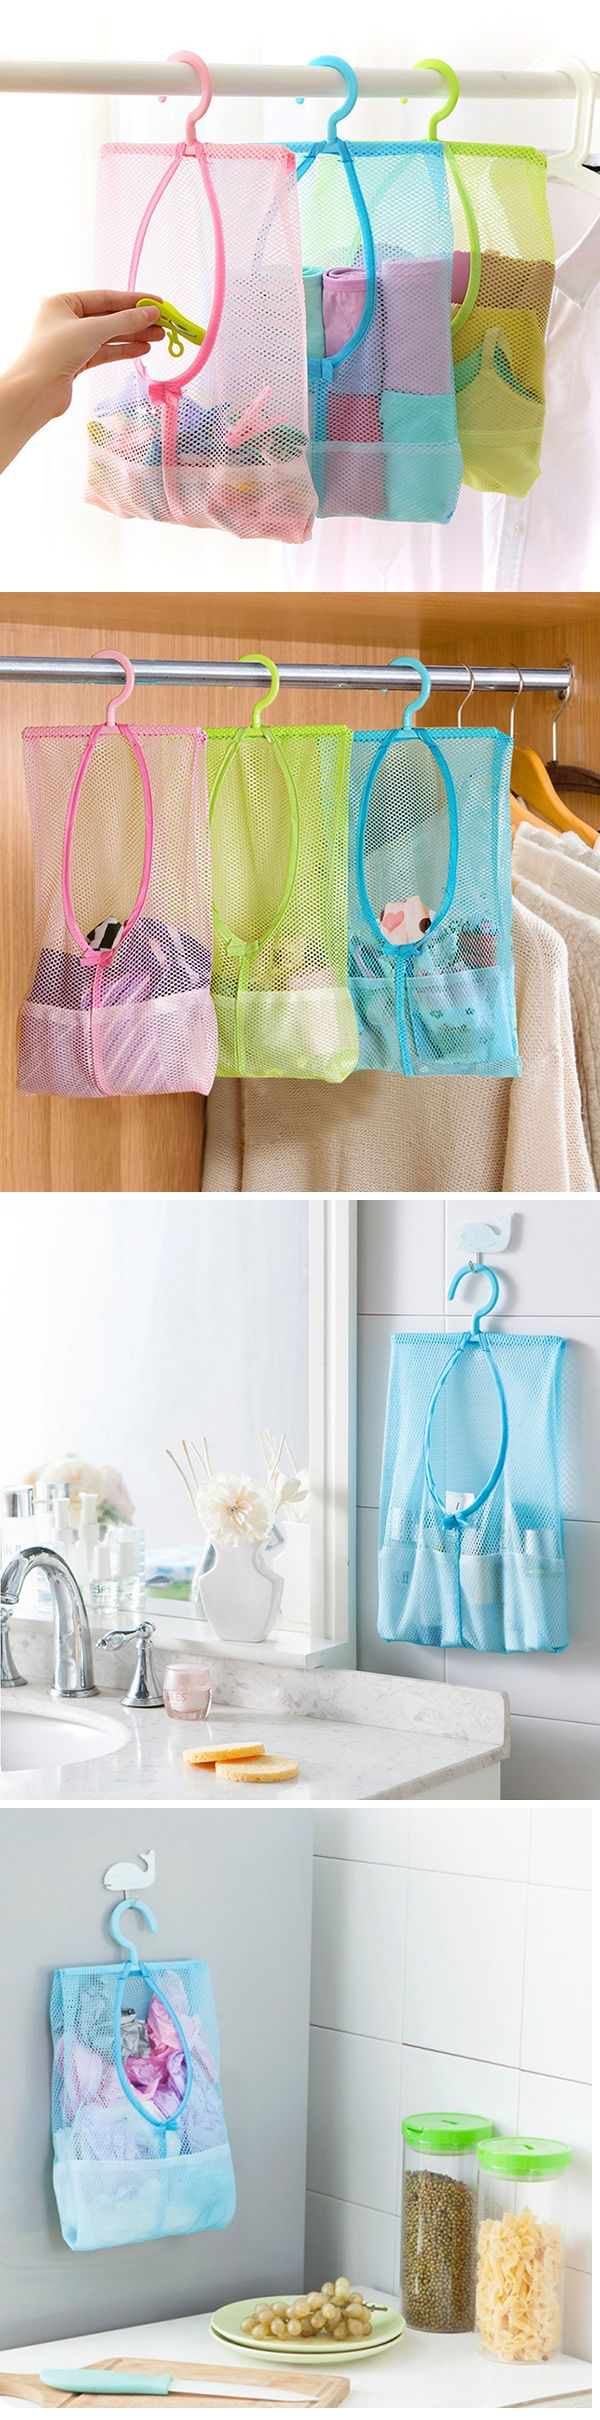 US$3.39  Underwear Socks Drying Bags Net Creative Home Wardrobe Small Objects Drying Basket